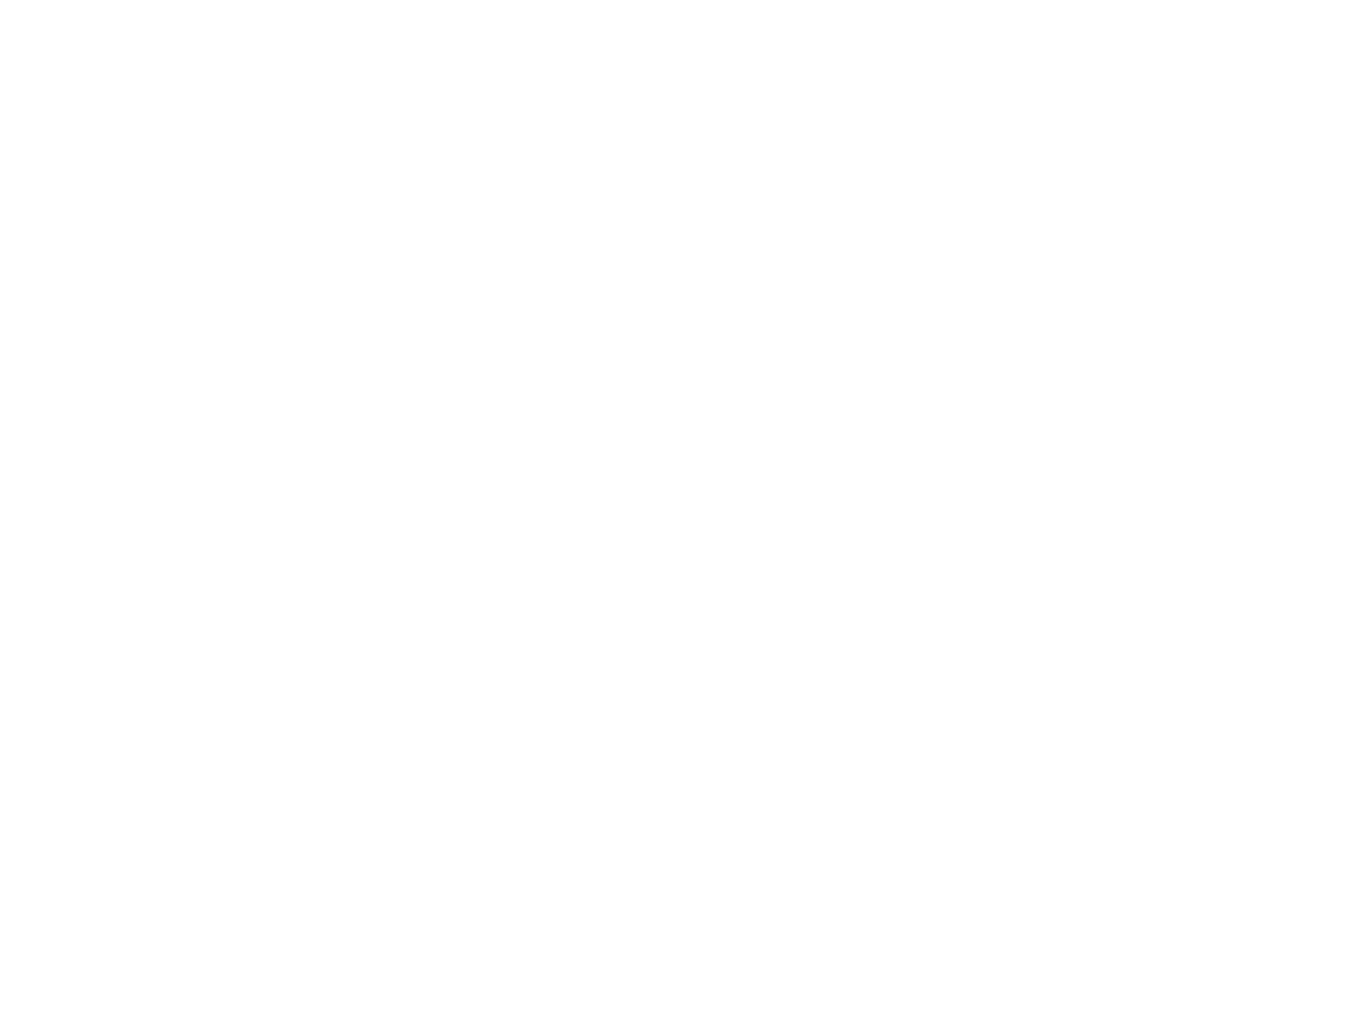 INE | 伊根〔DebugLog〕